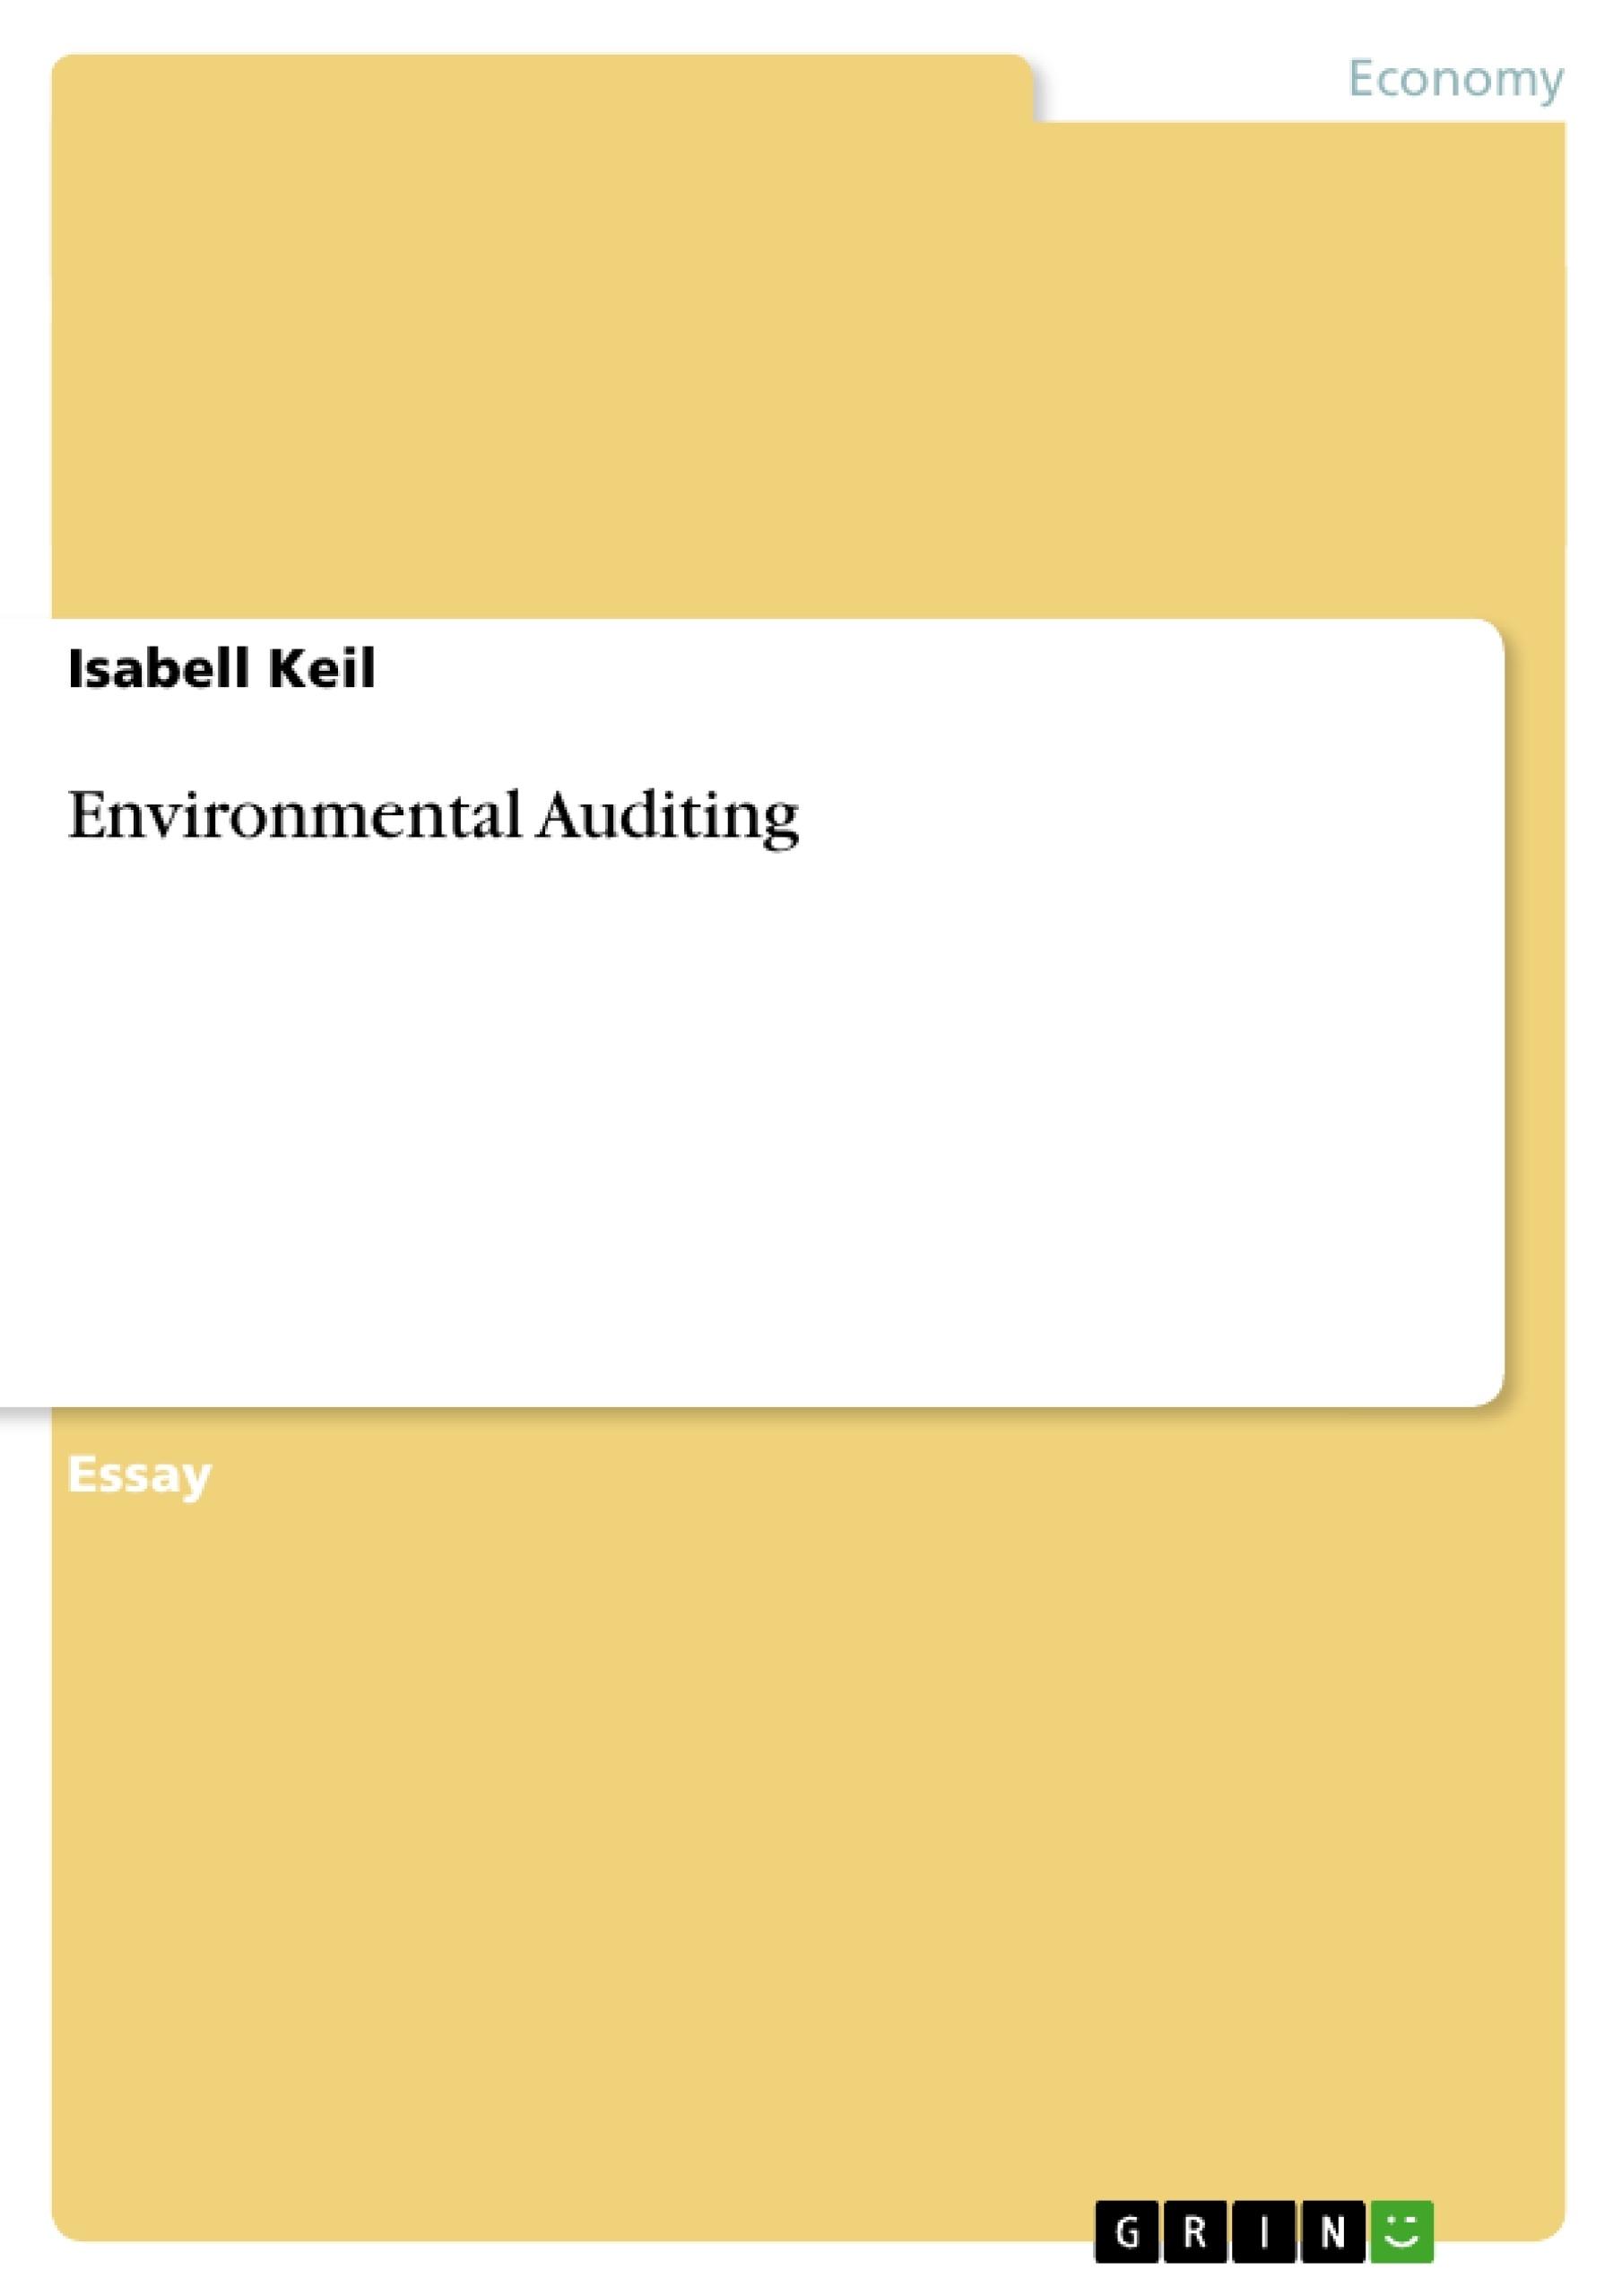 Title: Environmental Auditing